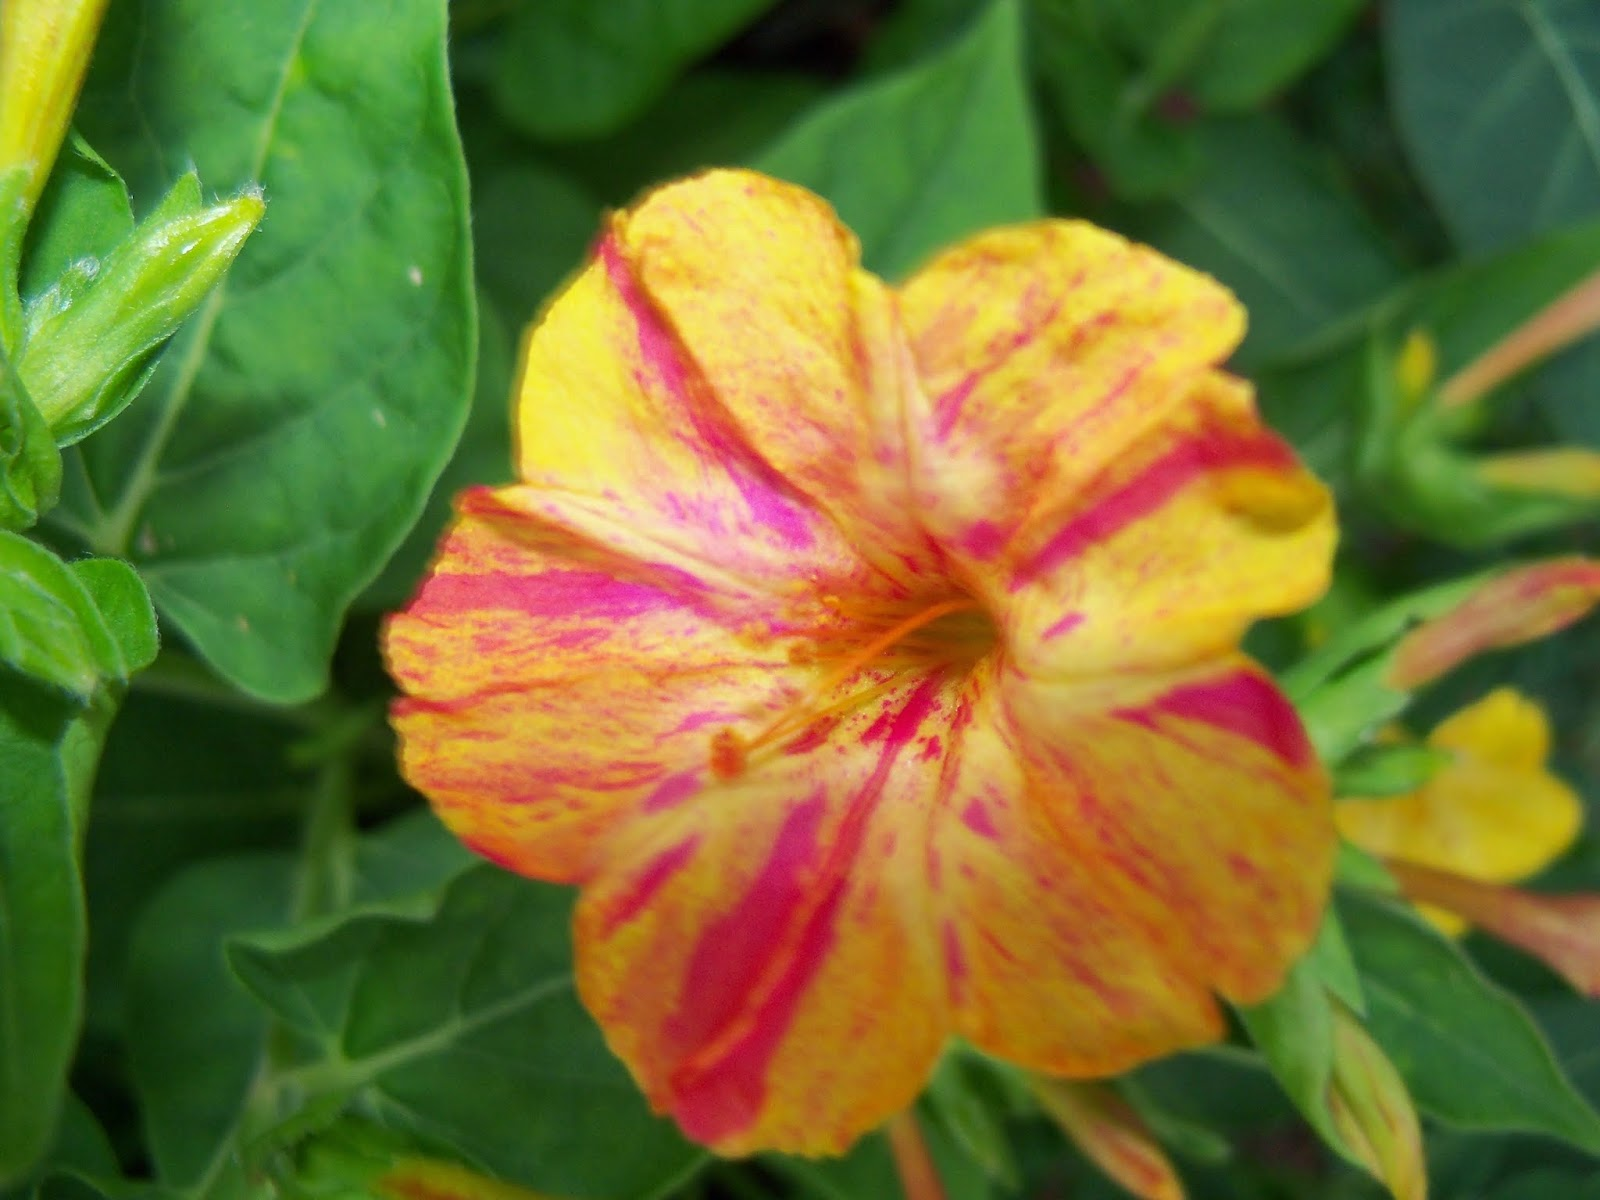 Gardening 2014 - 116_1969.JPG